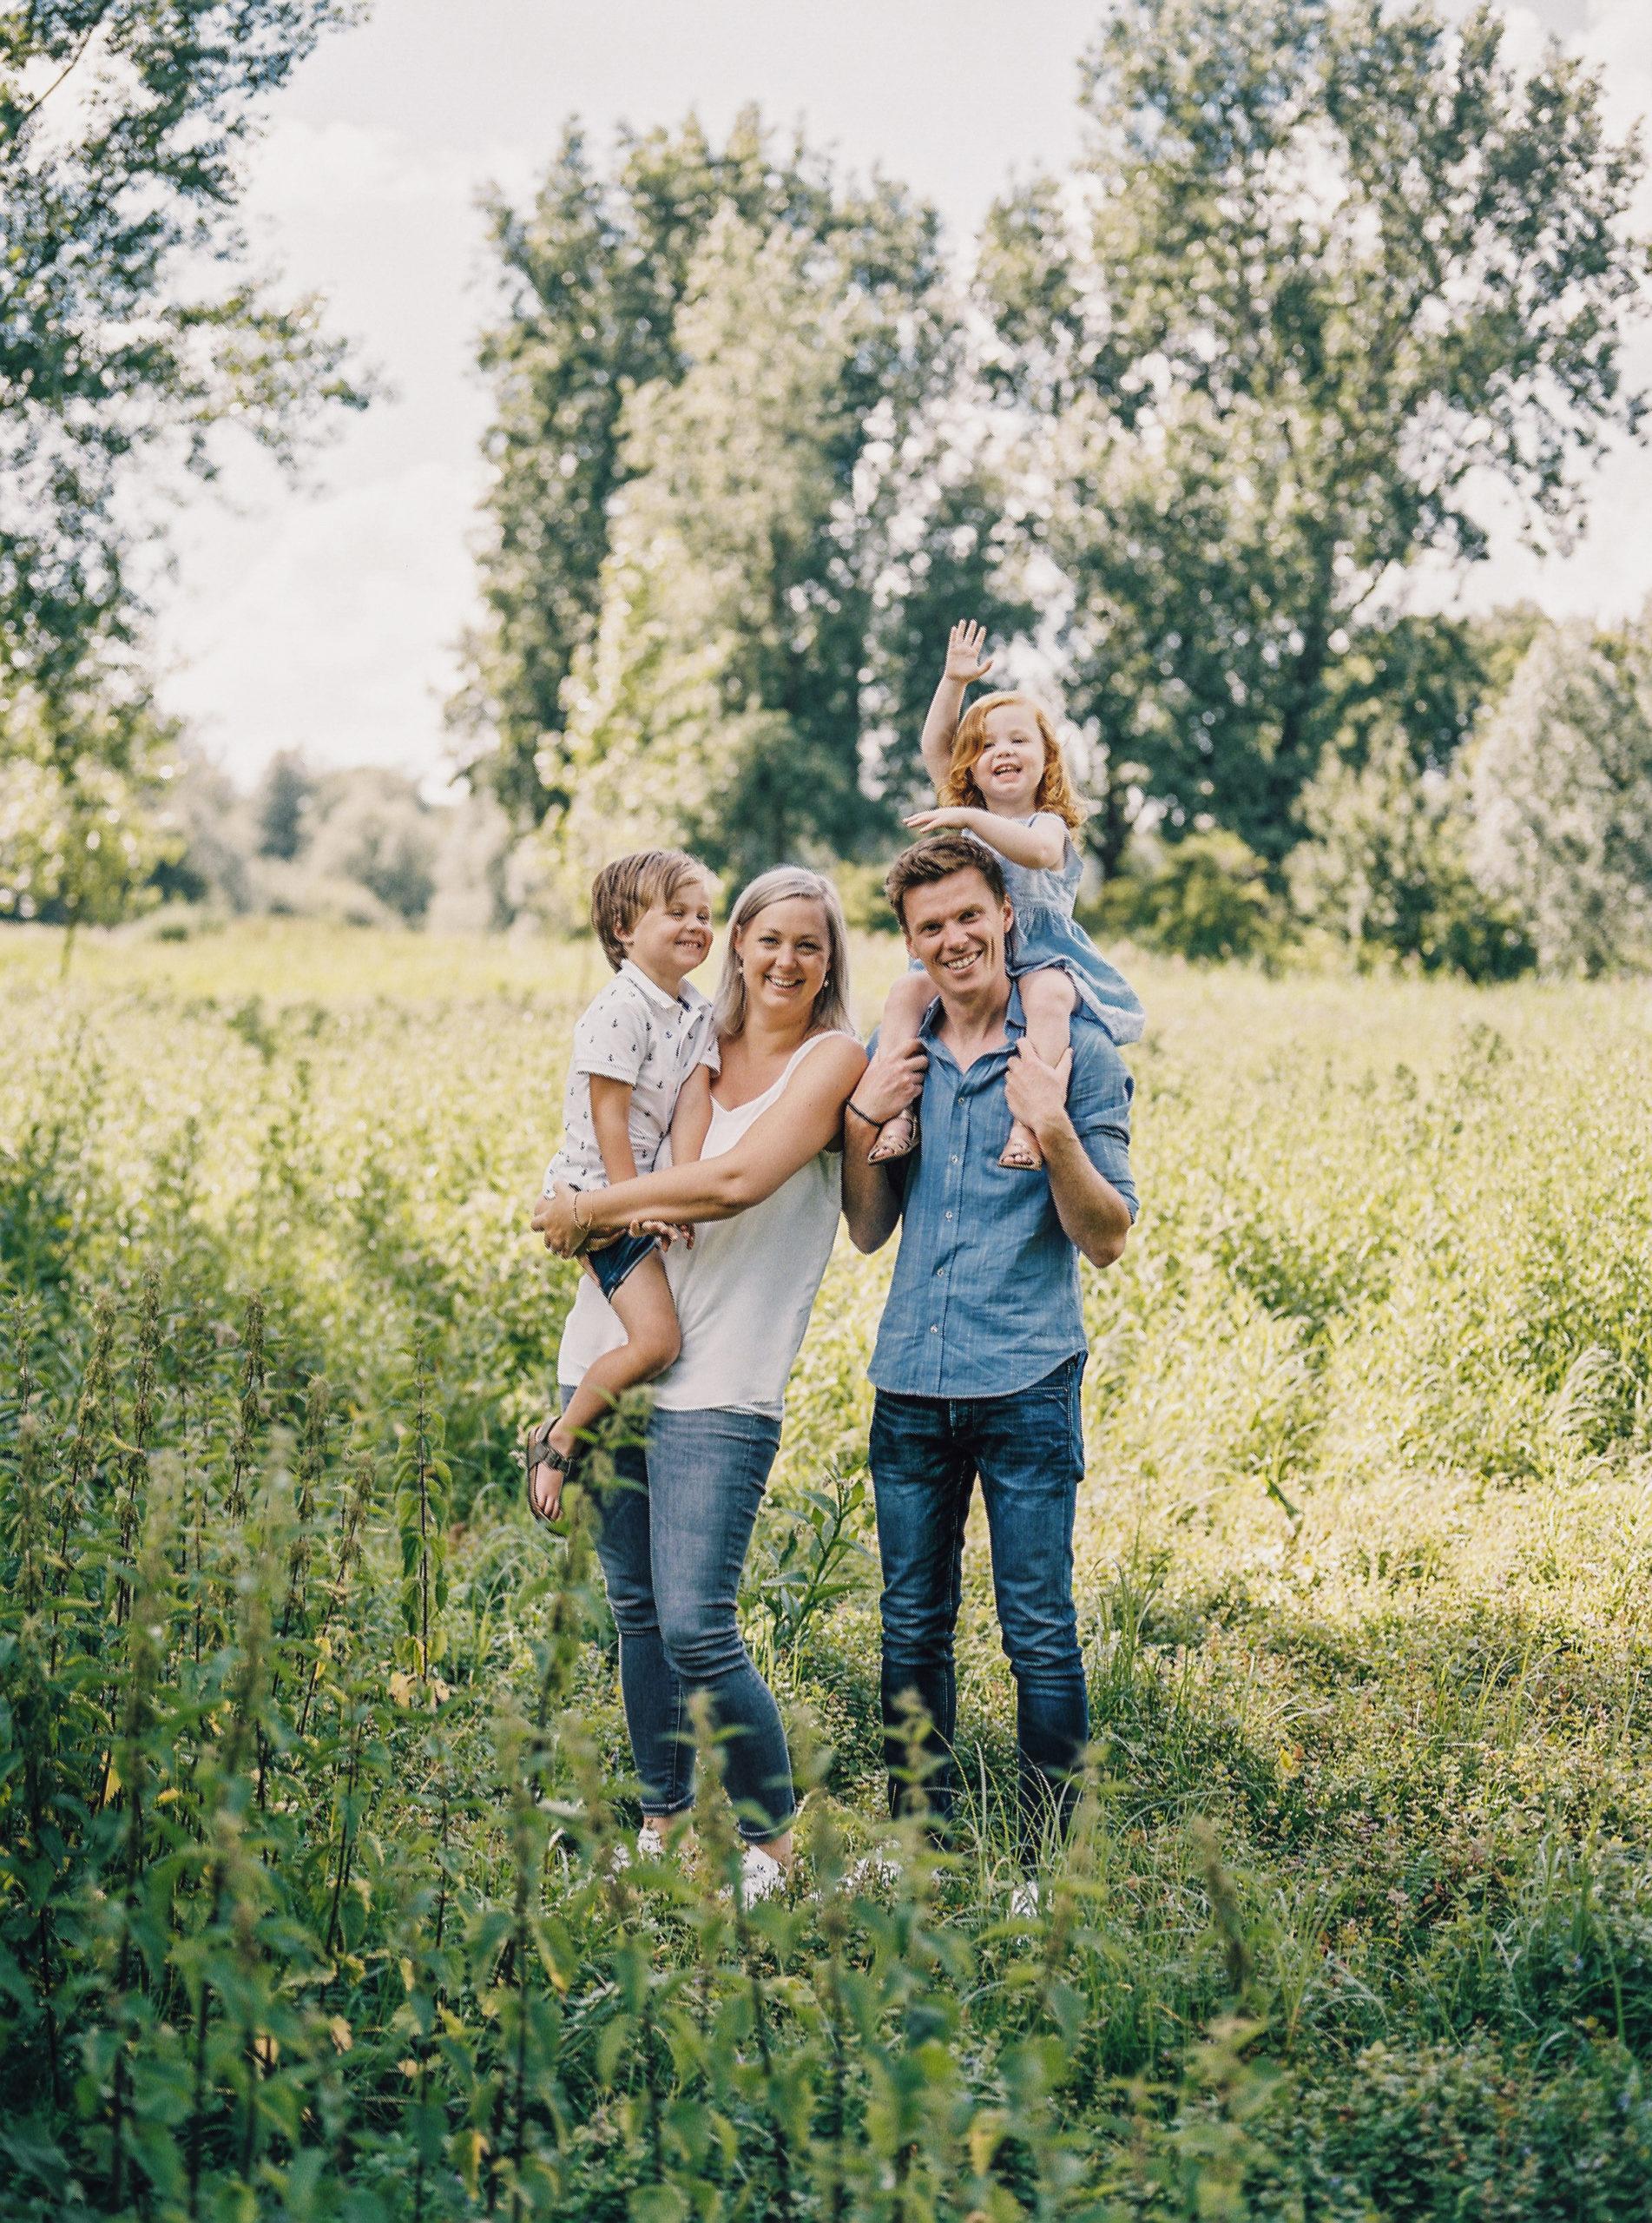 familiefotografie gezinsfotografie hanke arkenbout robin annick